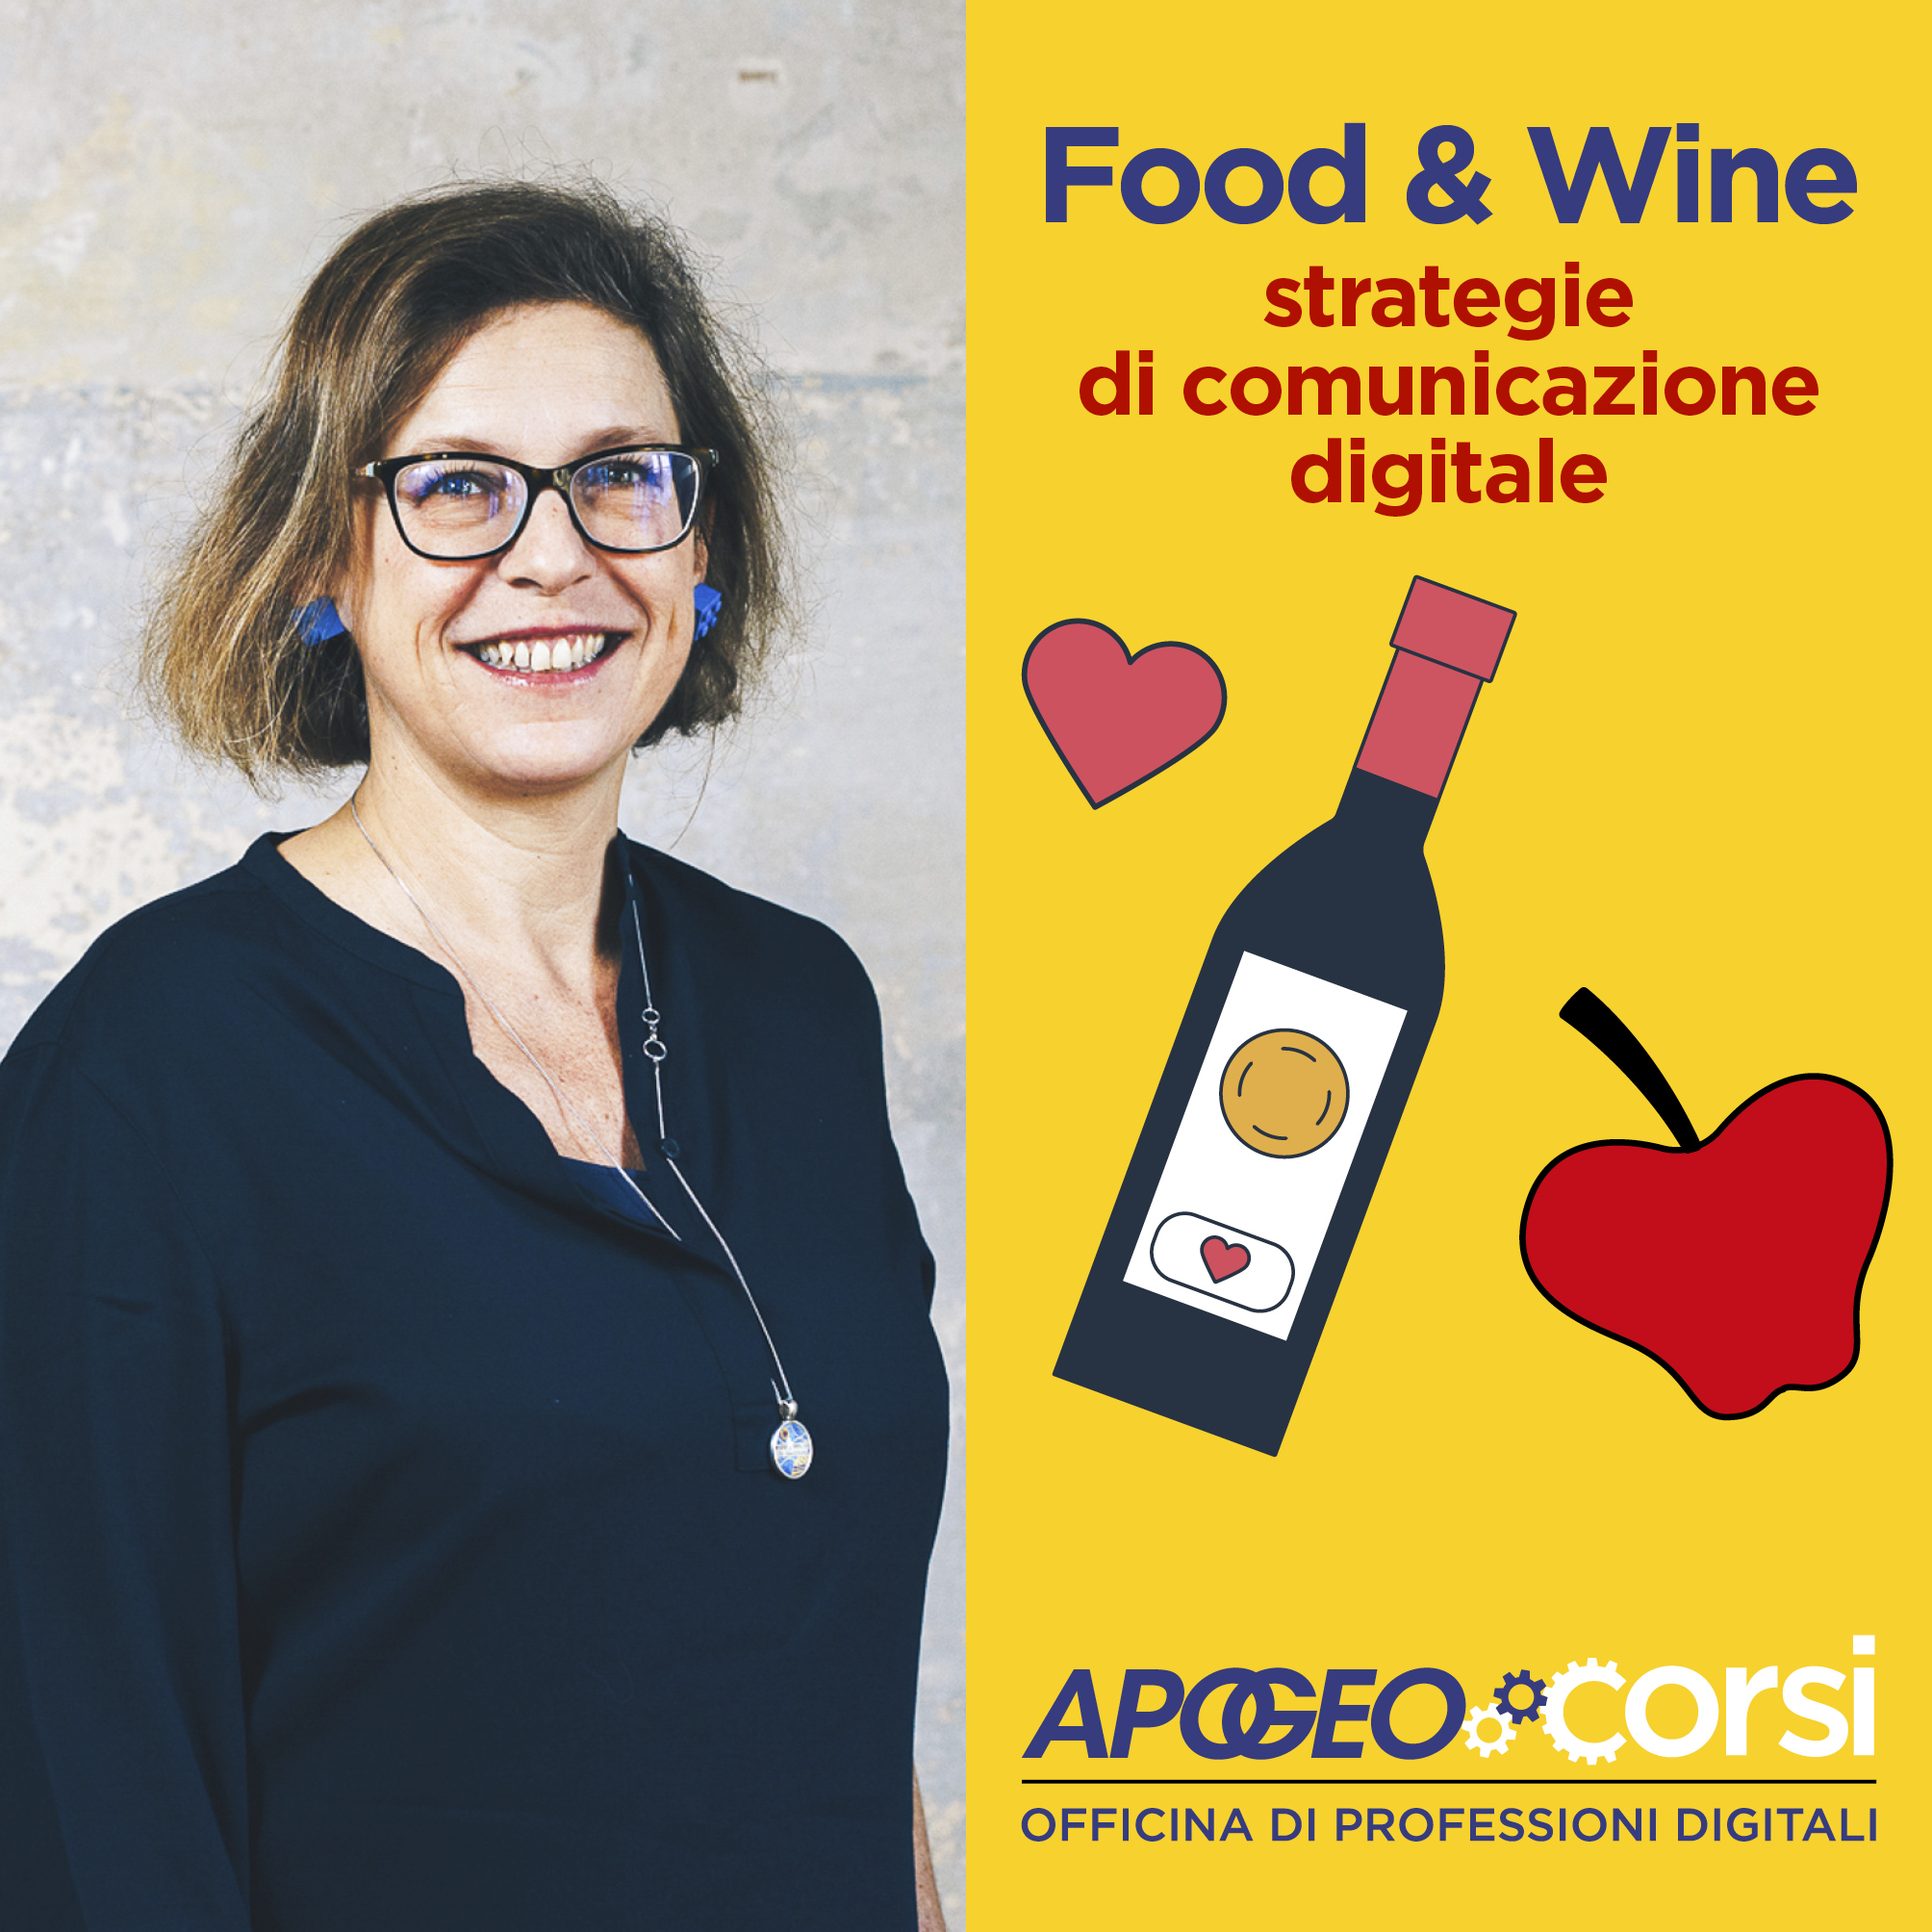 Food-e-Wine-strategie-di-comunicazione-digitale-cover